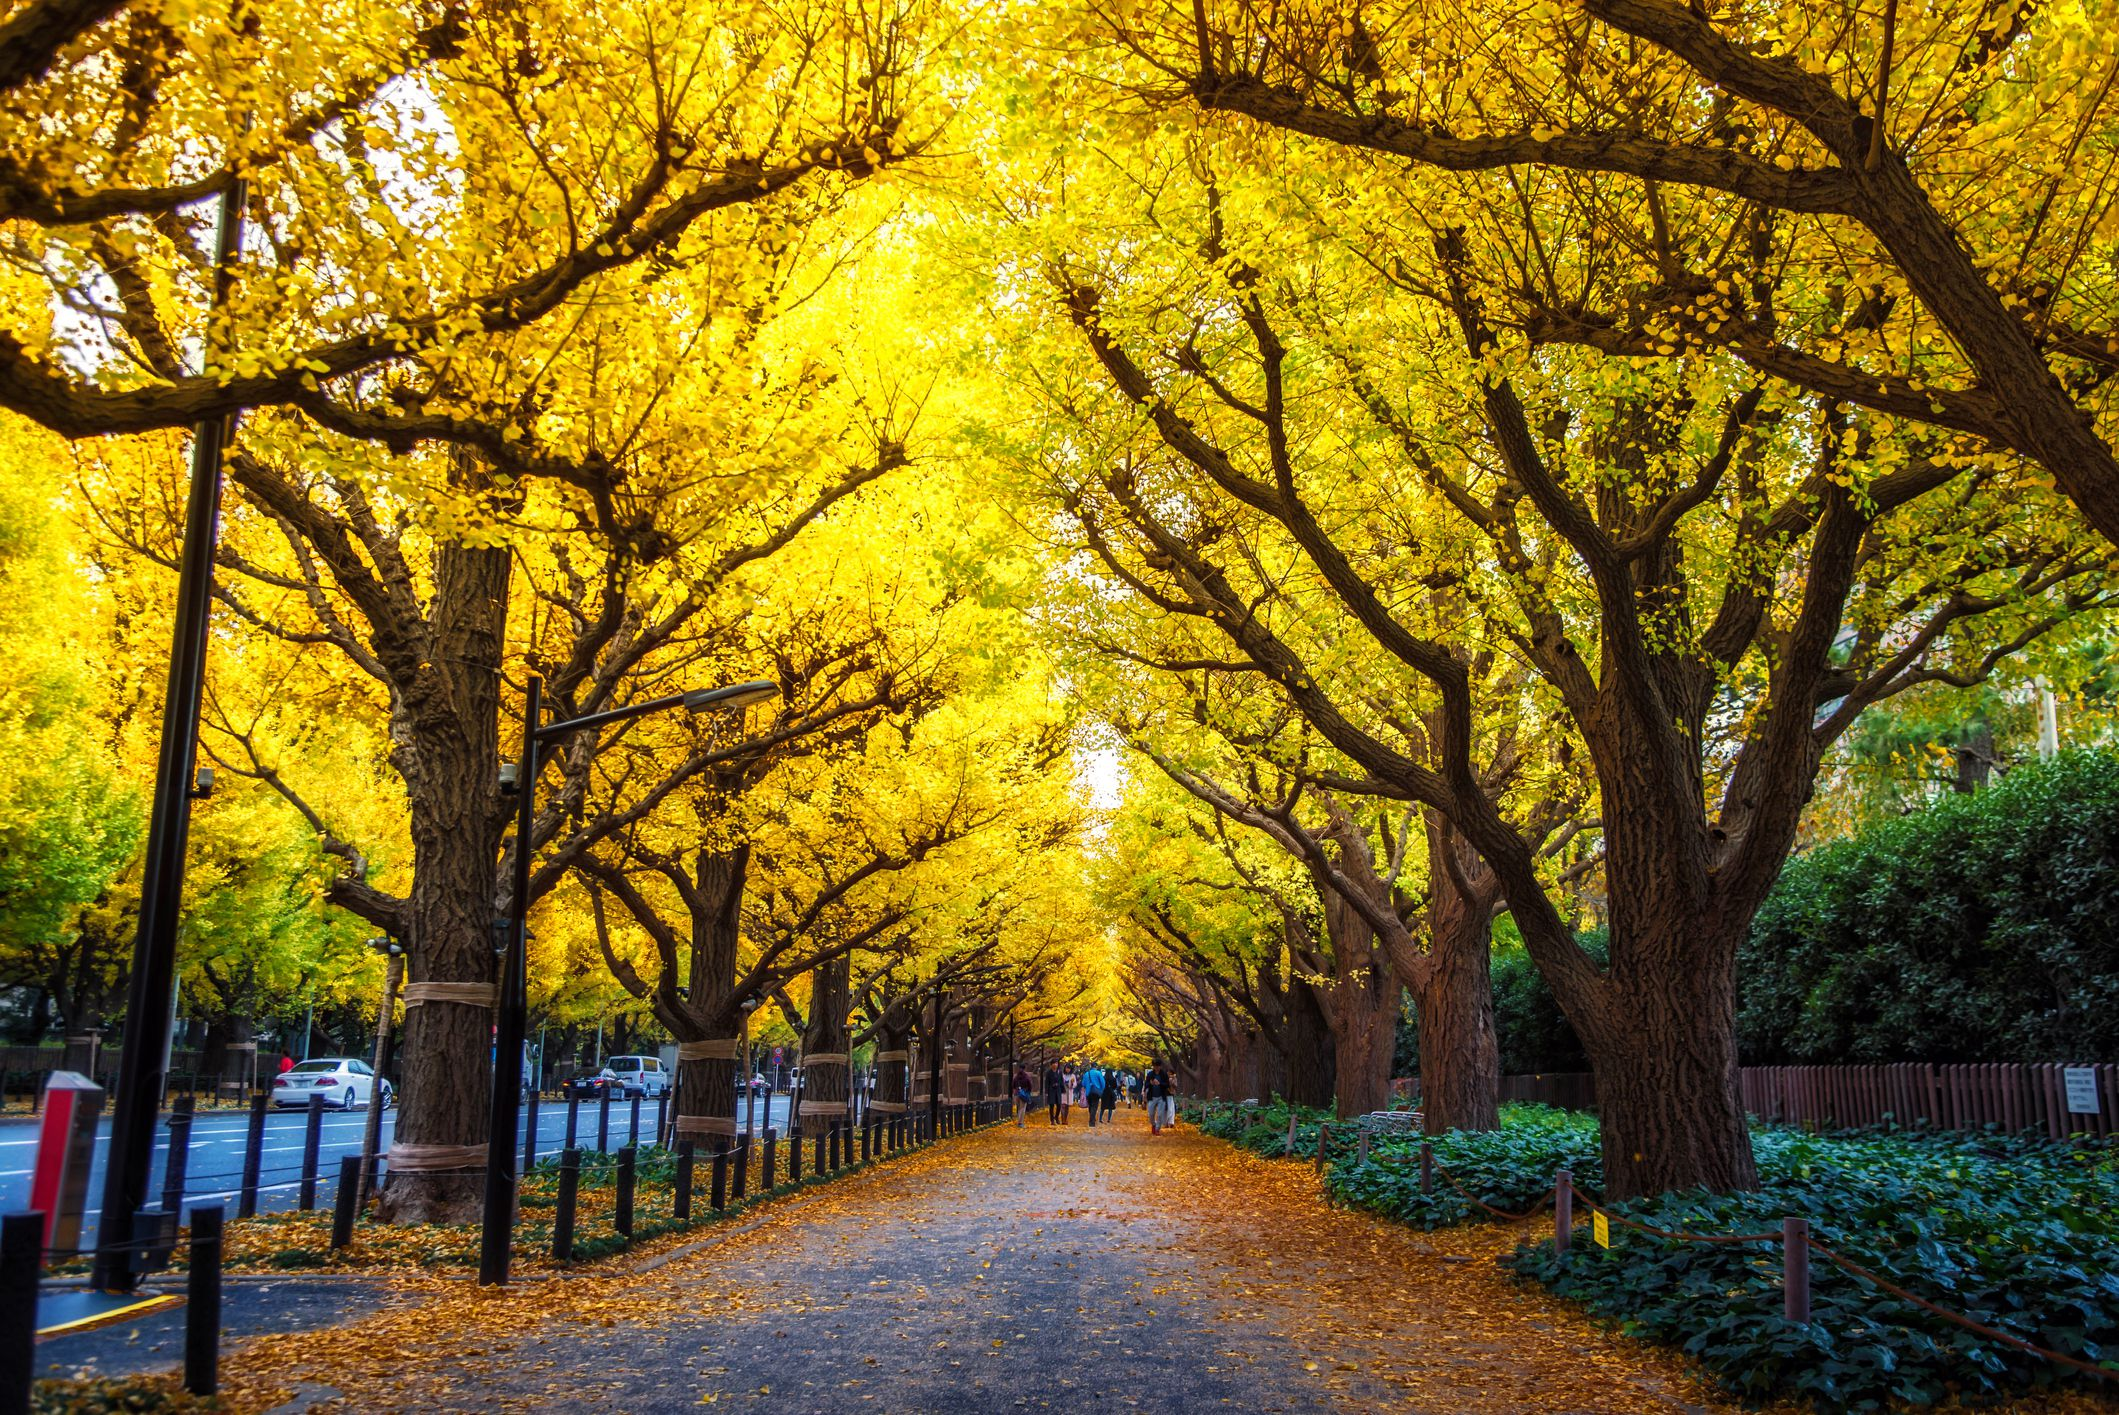 walkway lined with yellow gingko biloba trees